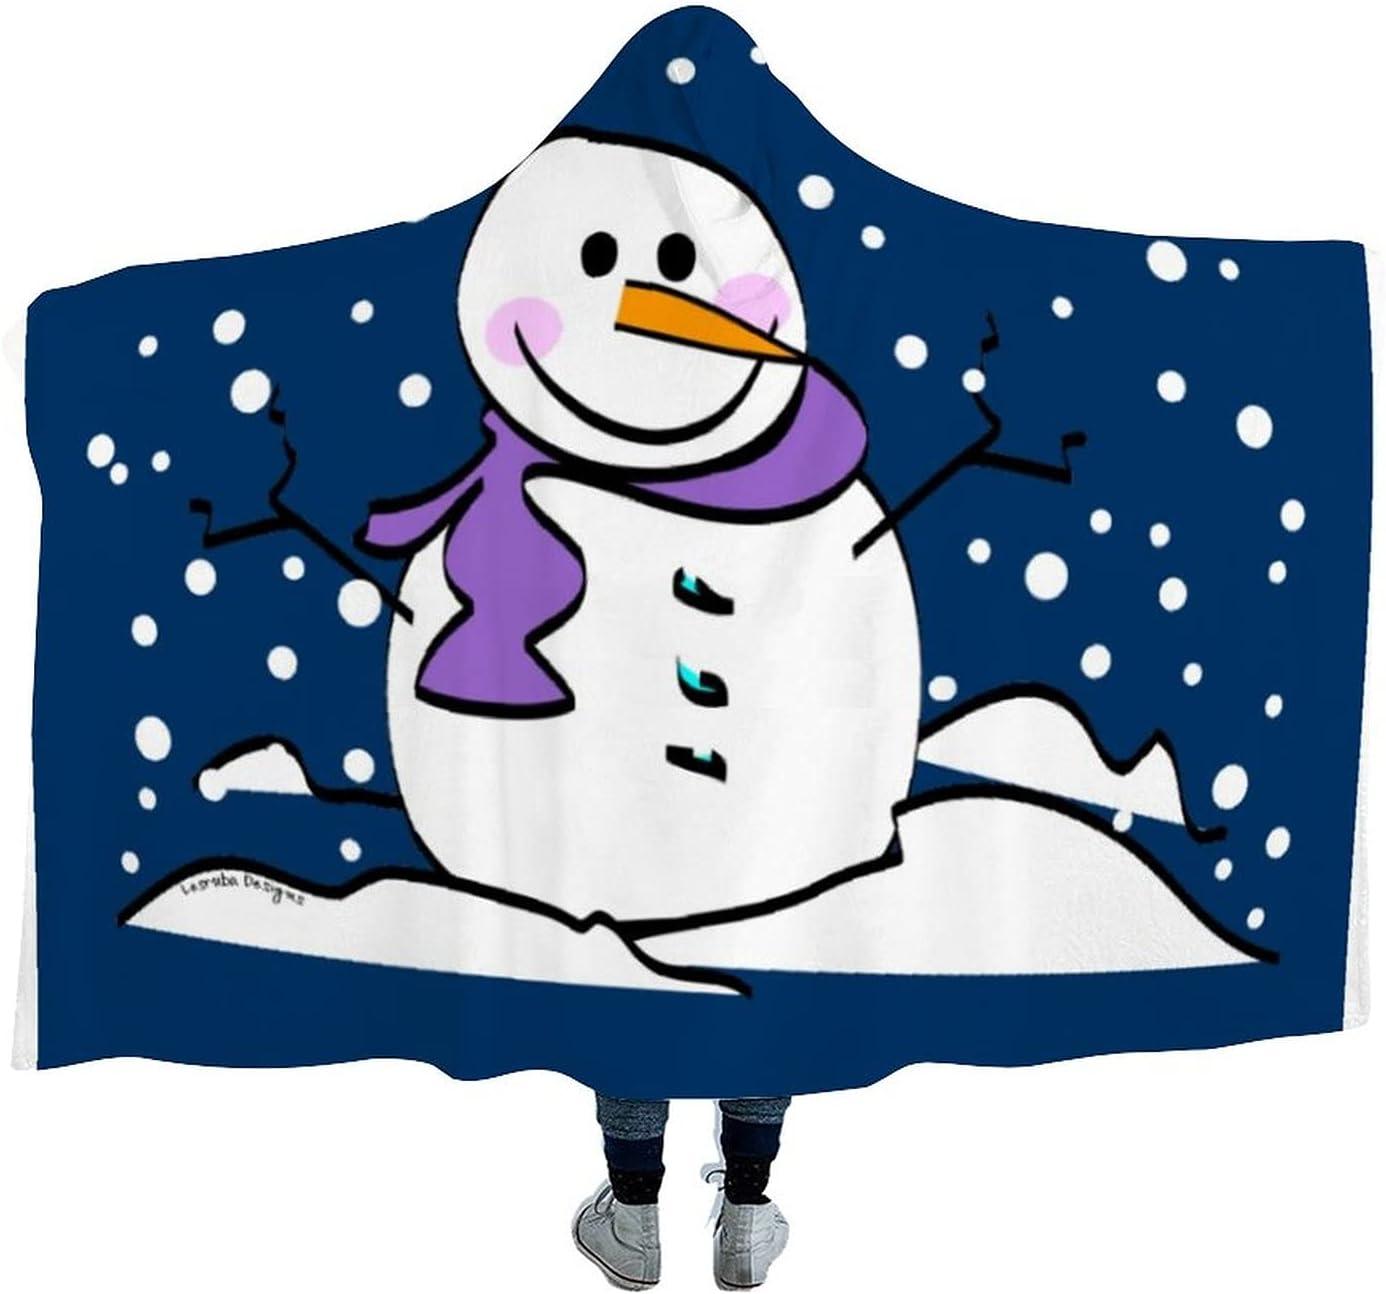 Winter Snowman Large-scale sale Wearable Hooded Blanket New popularity Cloak Throw Microfiber fo